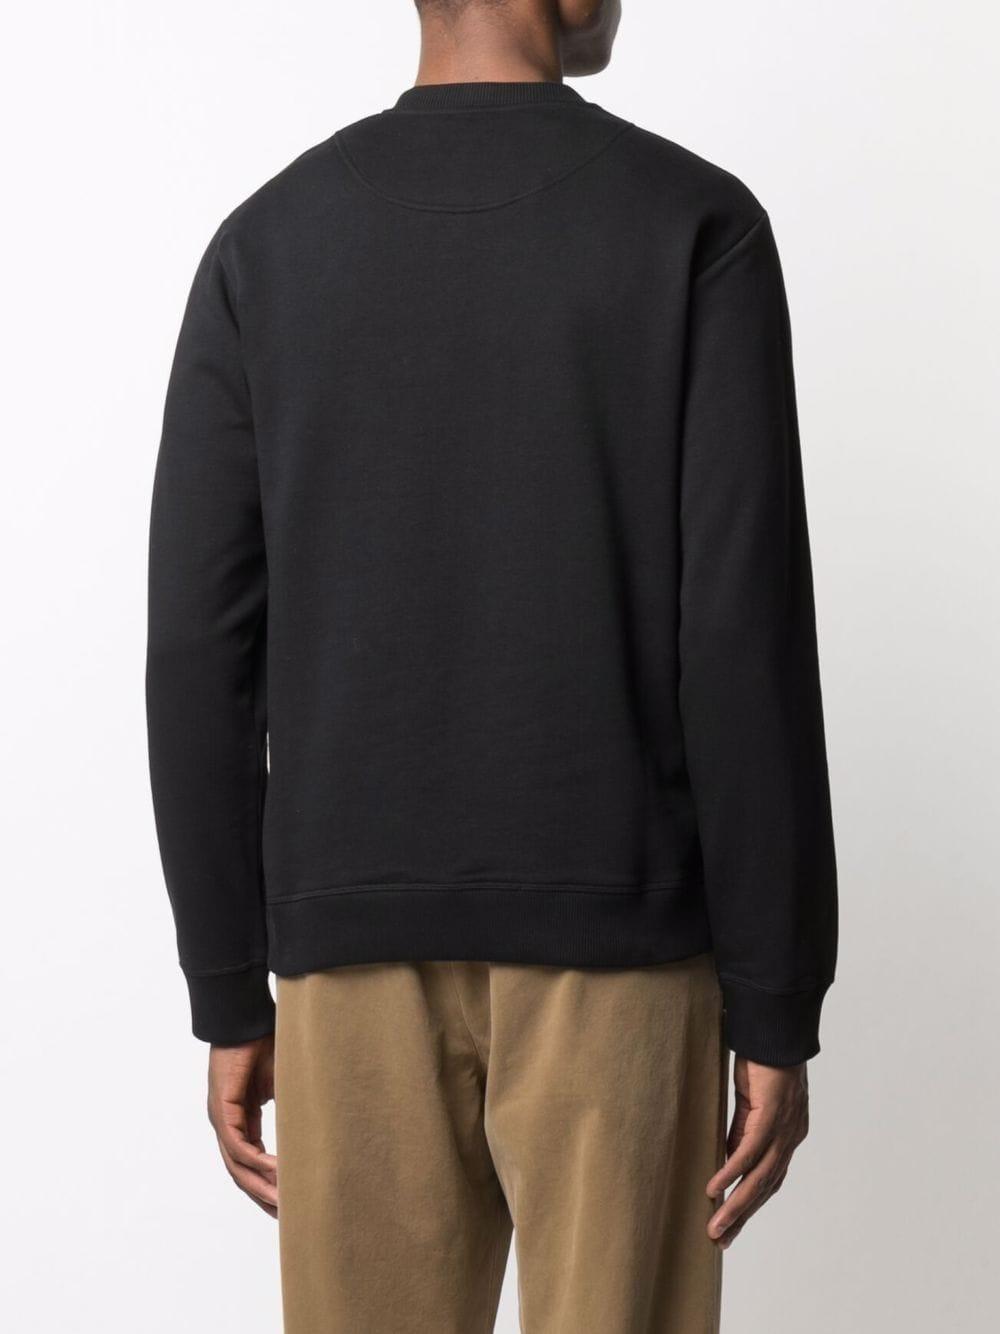 felpa con logo uomo nera in cotone KENZO | Felpe | FB65SW1234XA99